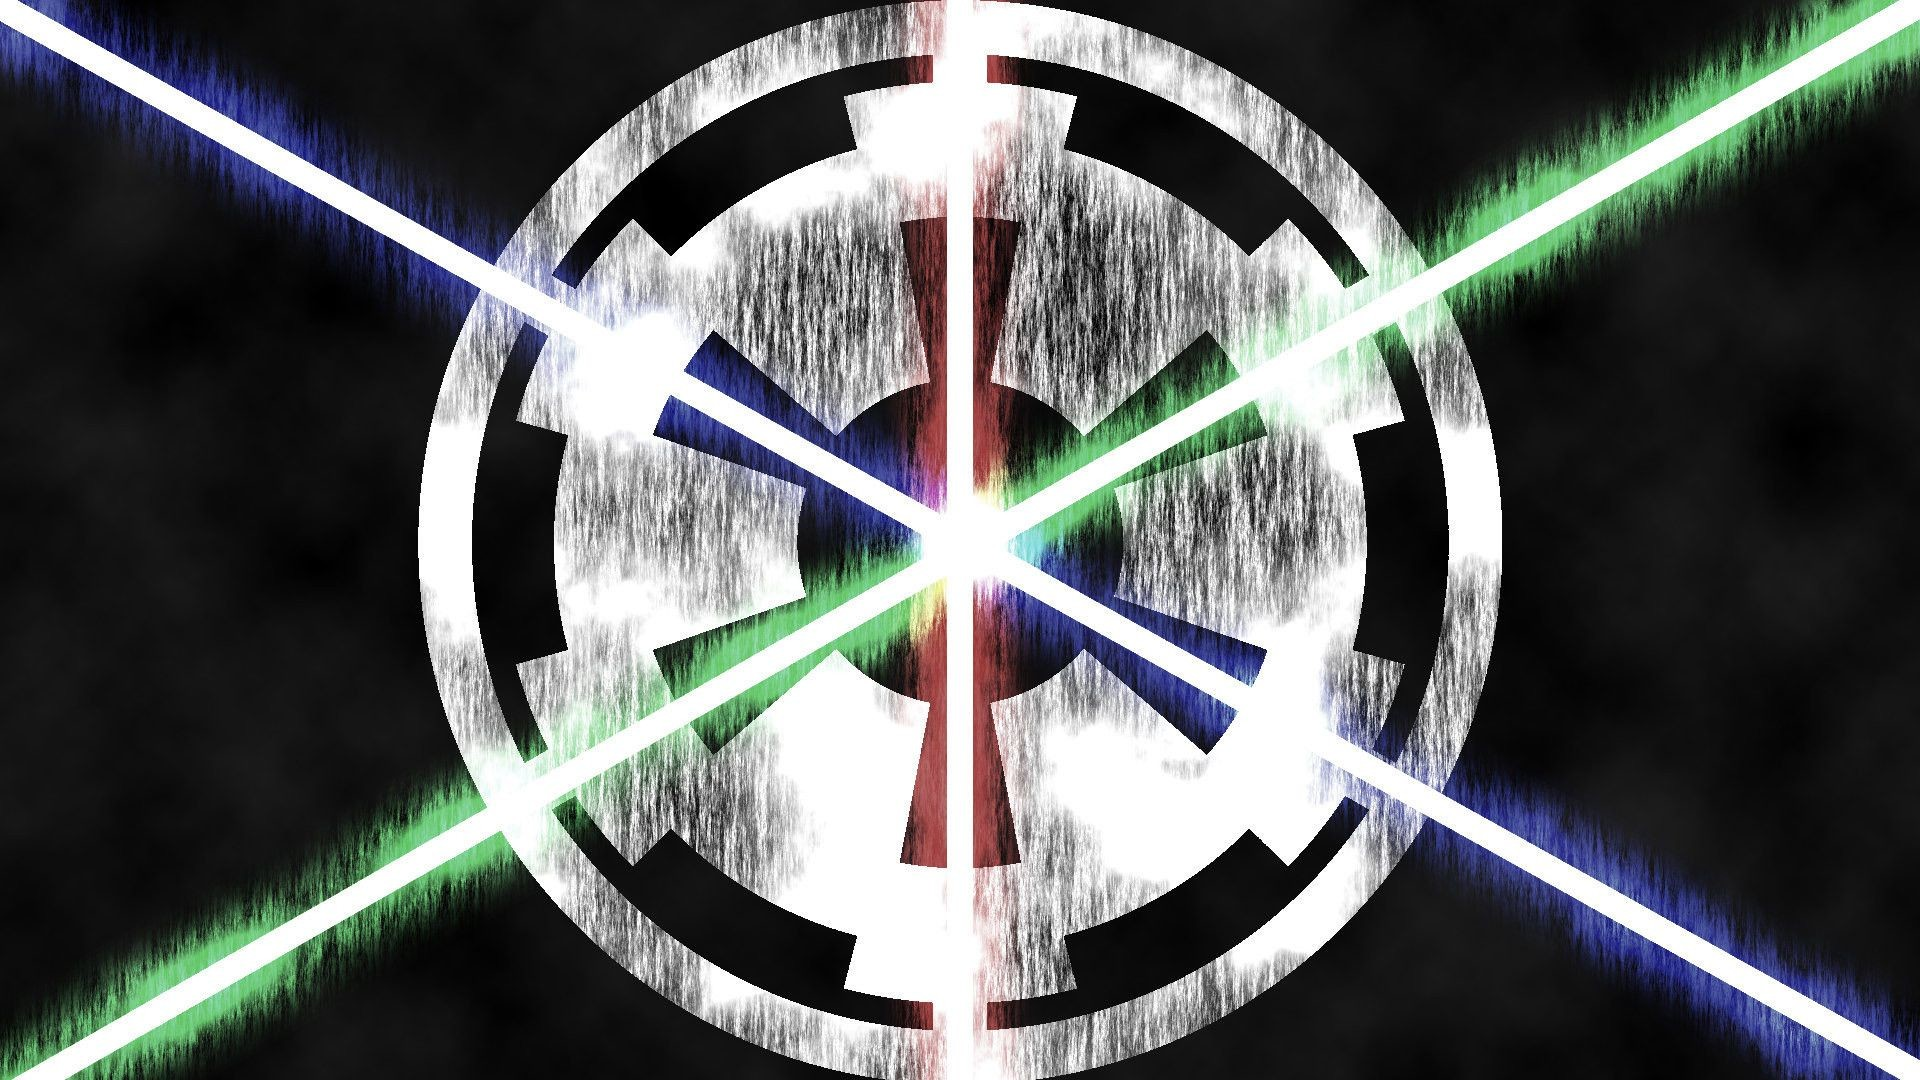 Star Wars Empire Picture …